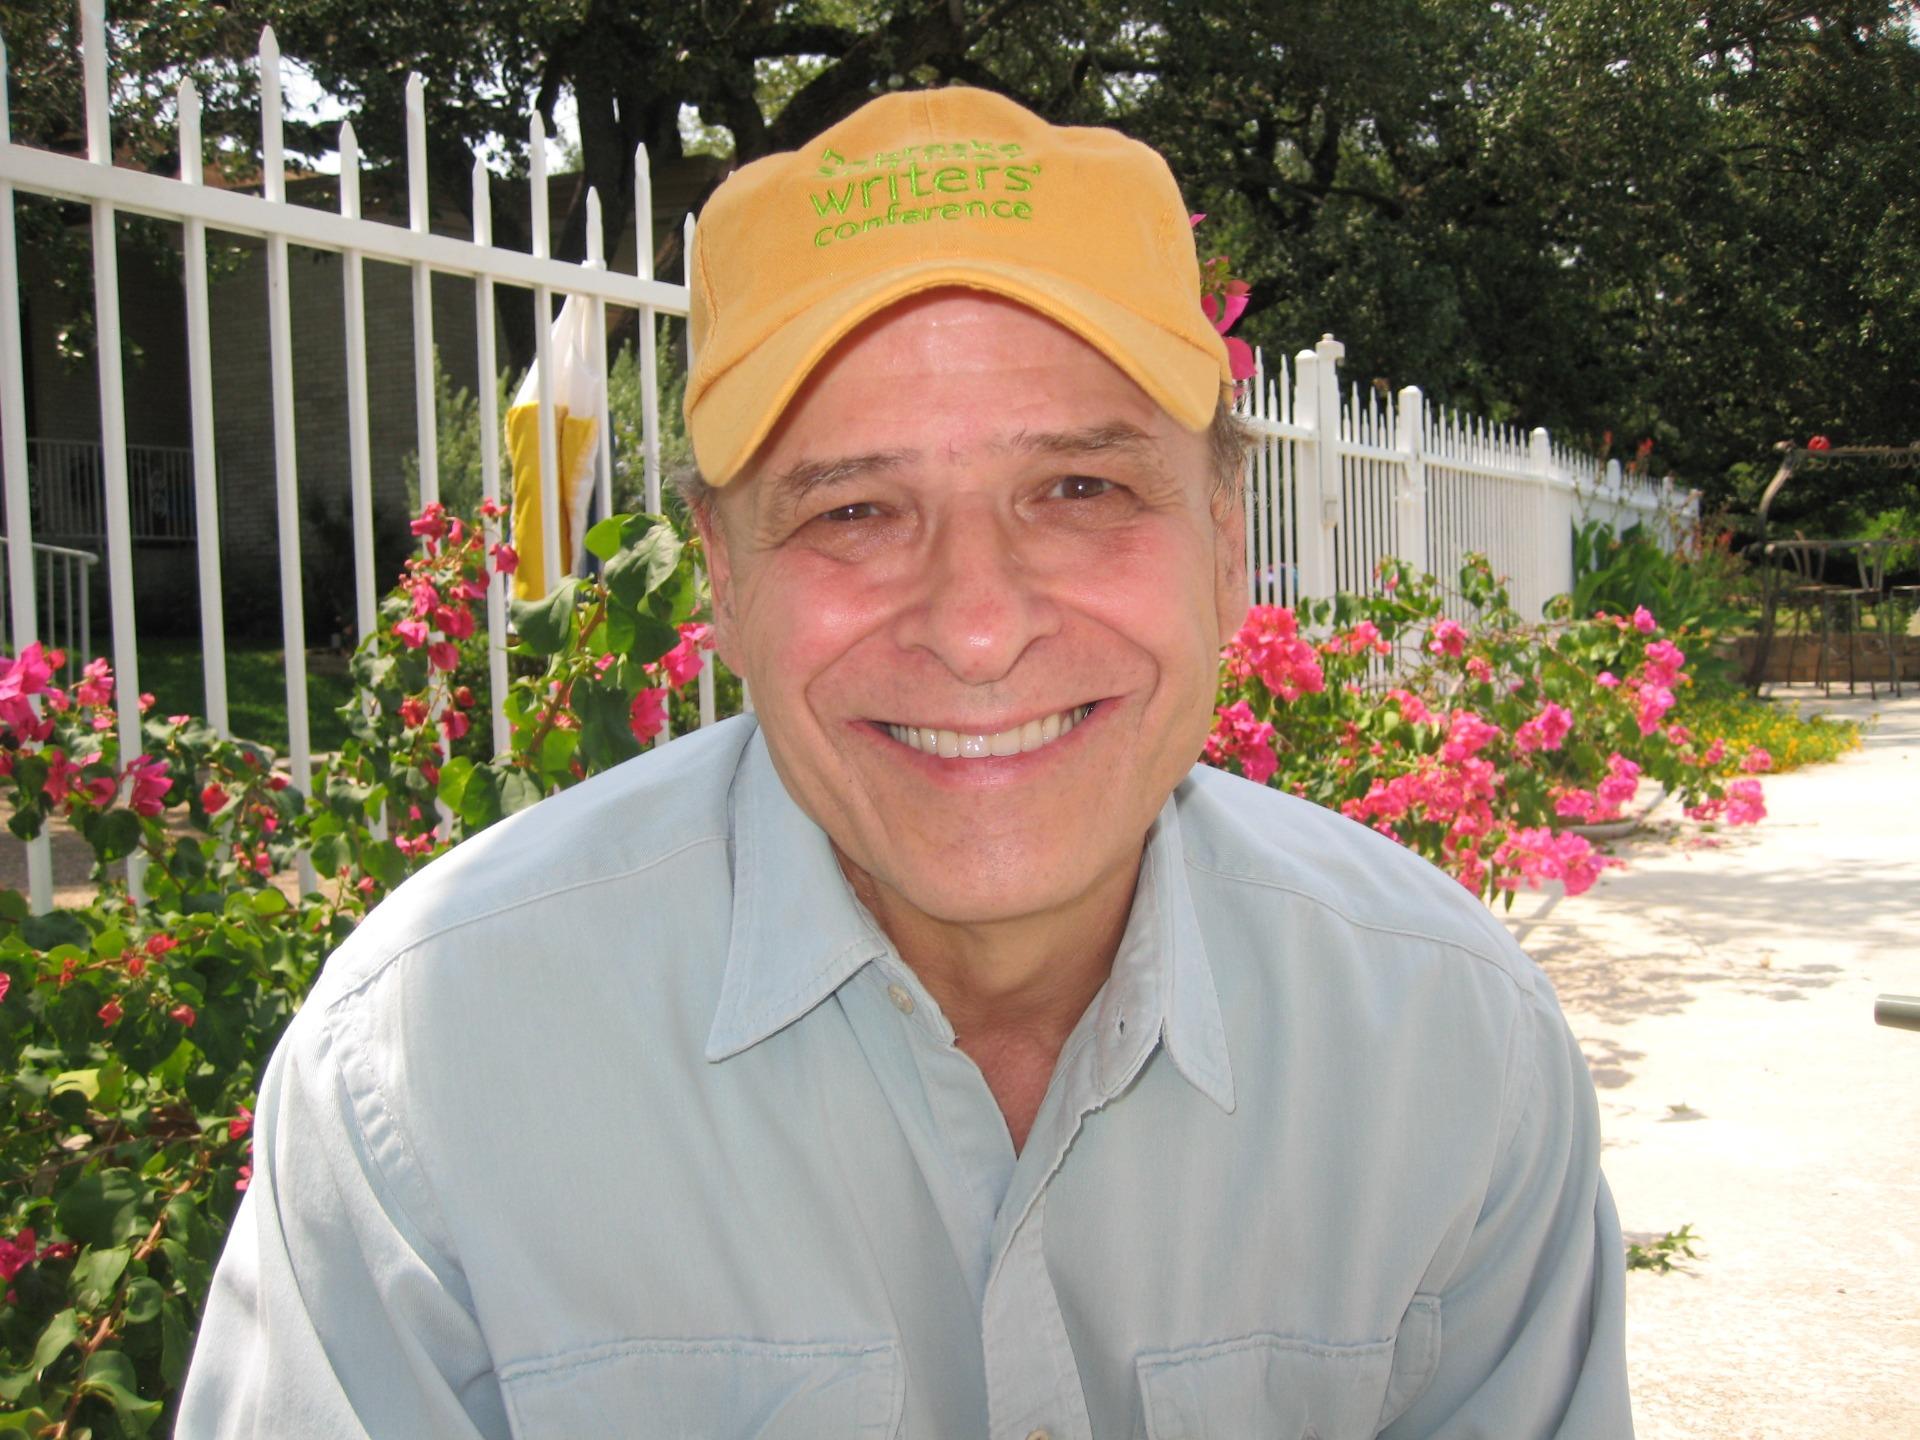 Tim OBrien